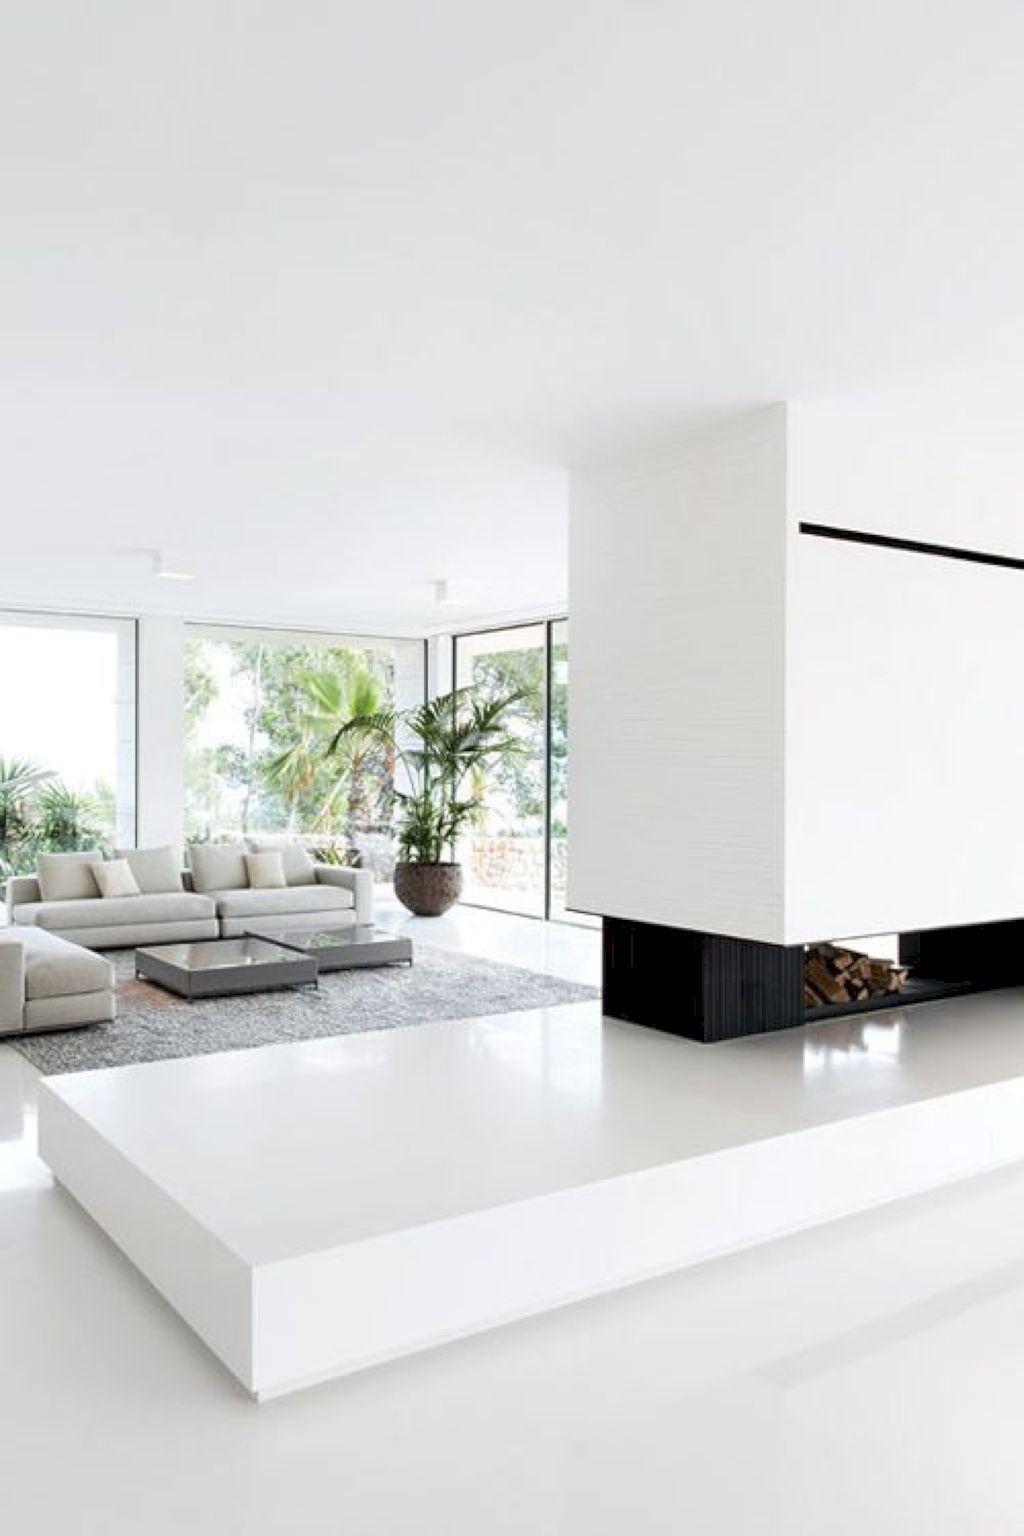 55 Insane Minimalist Home Decor Ideas On A Budget | Minimalist ...